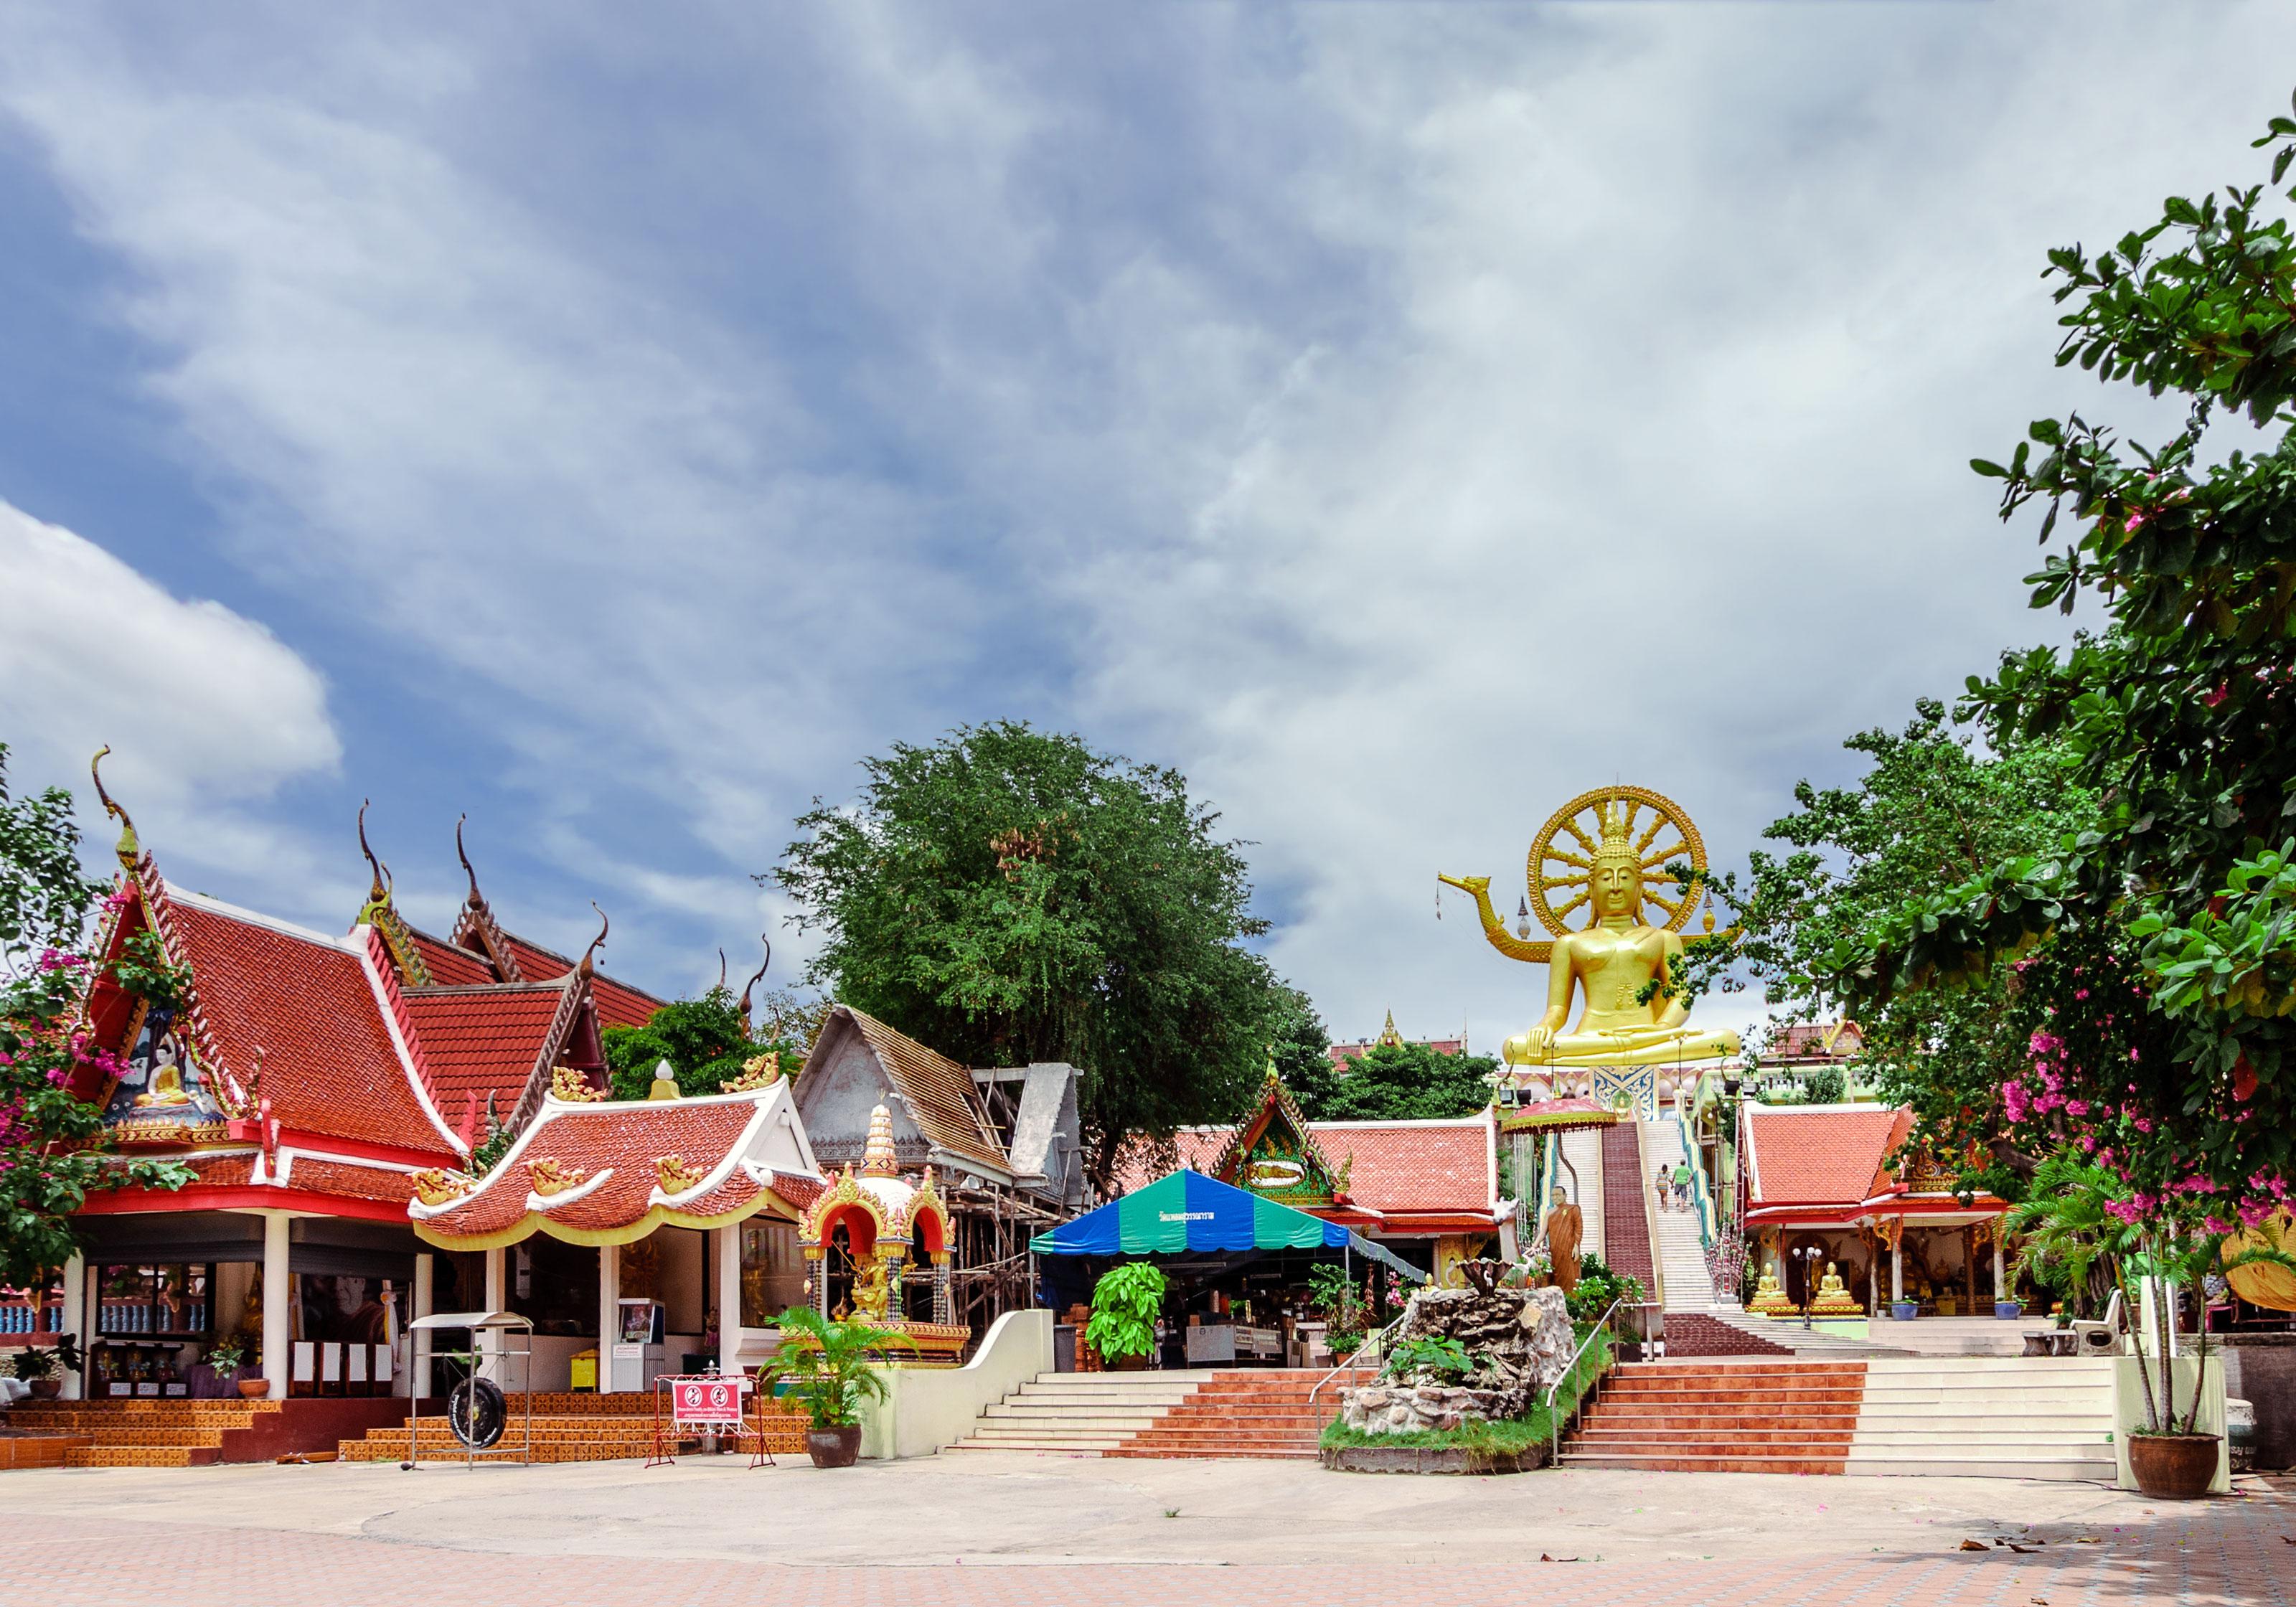 big buddha temple (wat phra yai).jpg